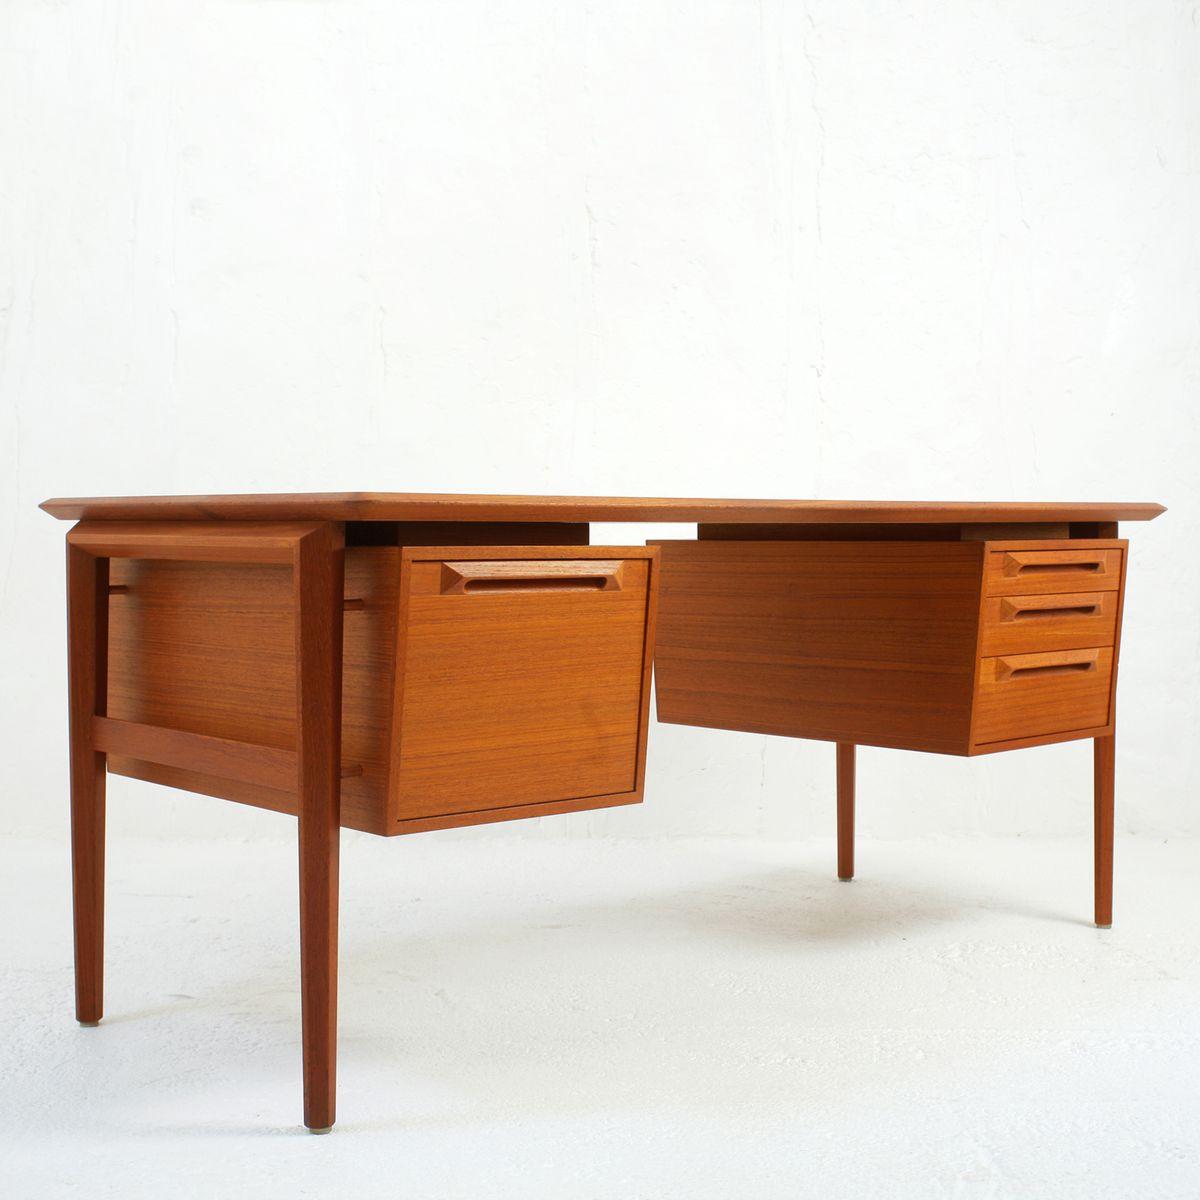 Swedish Teak Desk by Ib Kofod Larsen for Seffle Mobelfabrik, 1960s for sale at Pamono